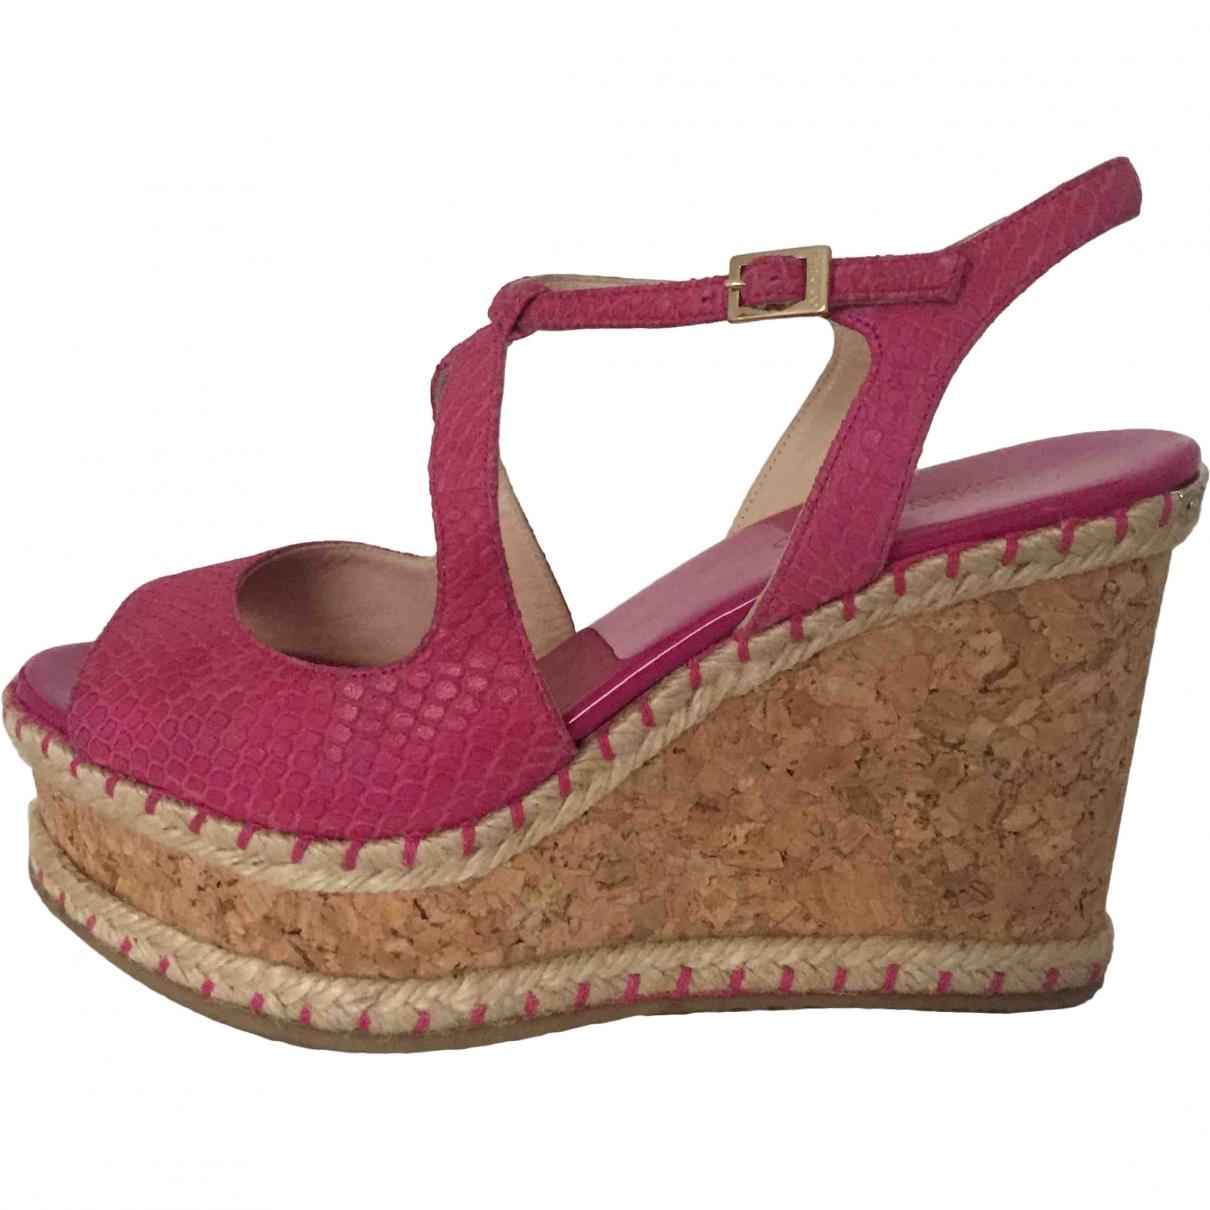 Jimmy Choo \N Exotic leathers Sandals for Women 39 EU